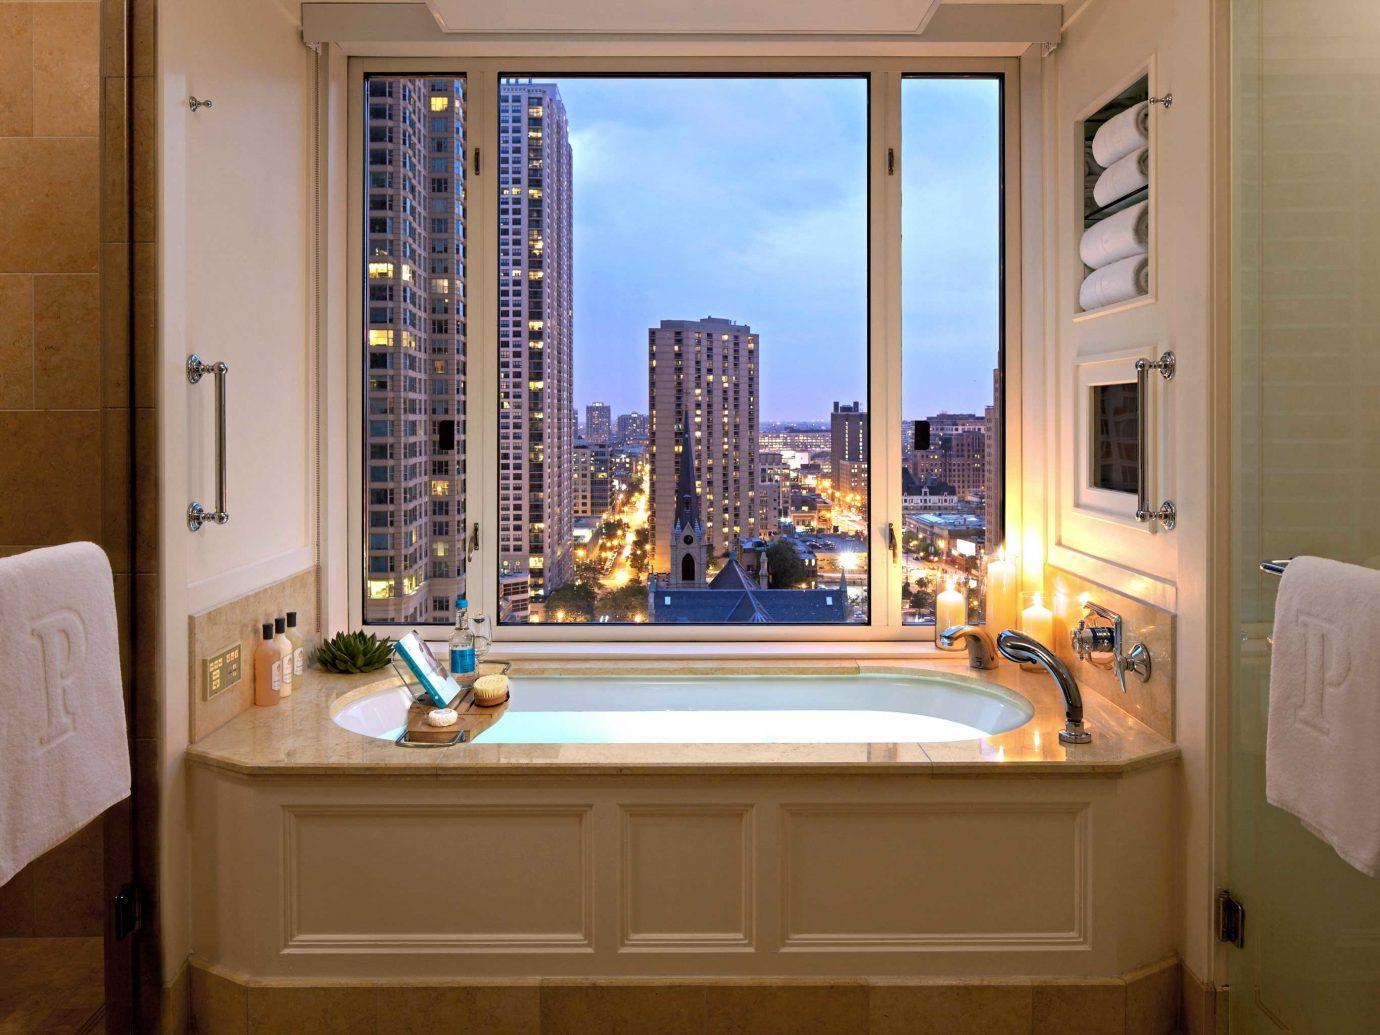 Bathroom at Peninsula Chicago